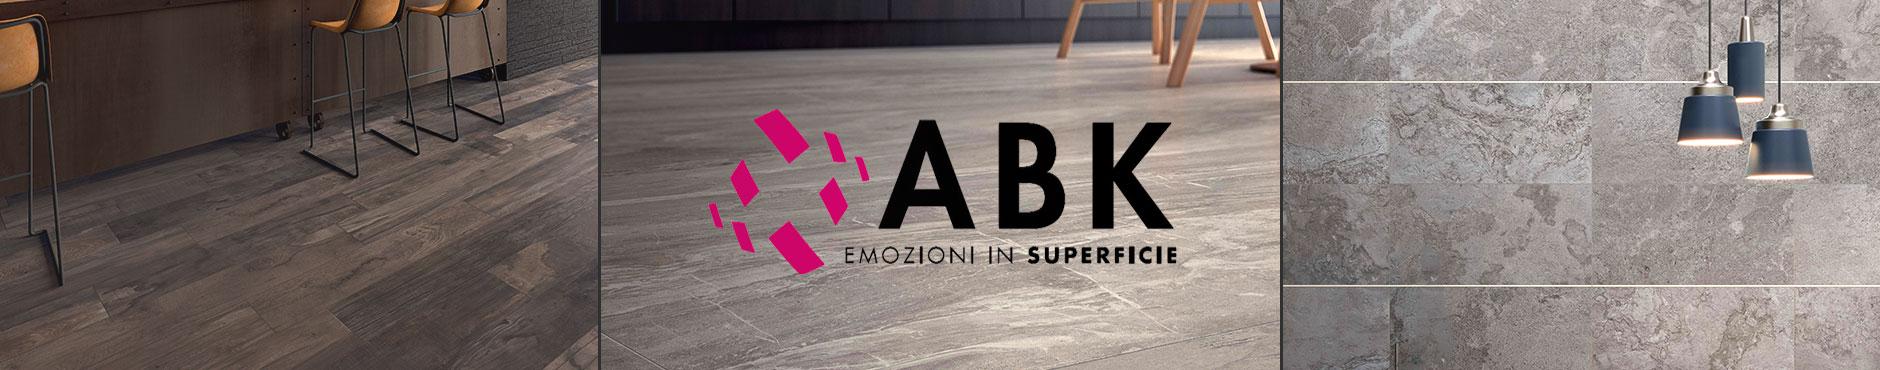 ABK tiles - massive price reductions